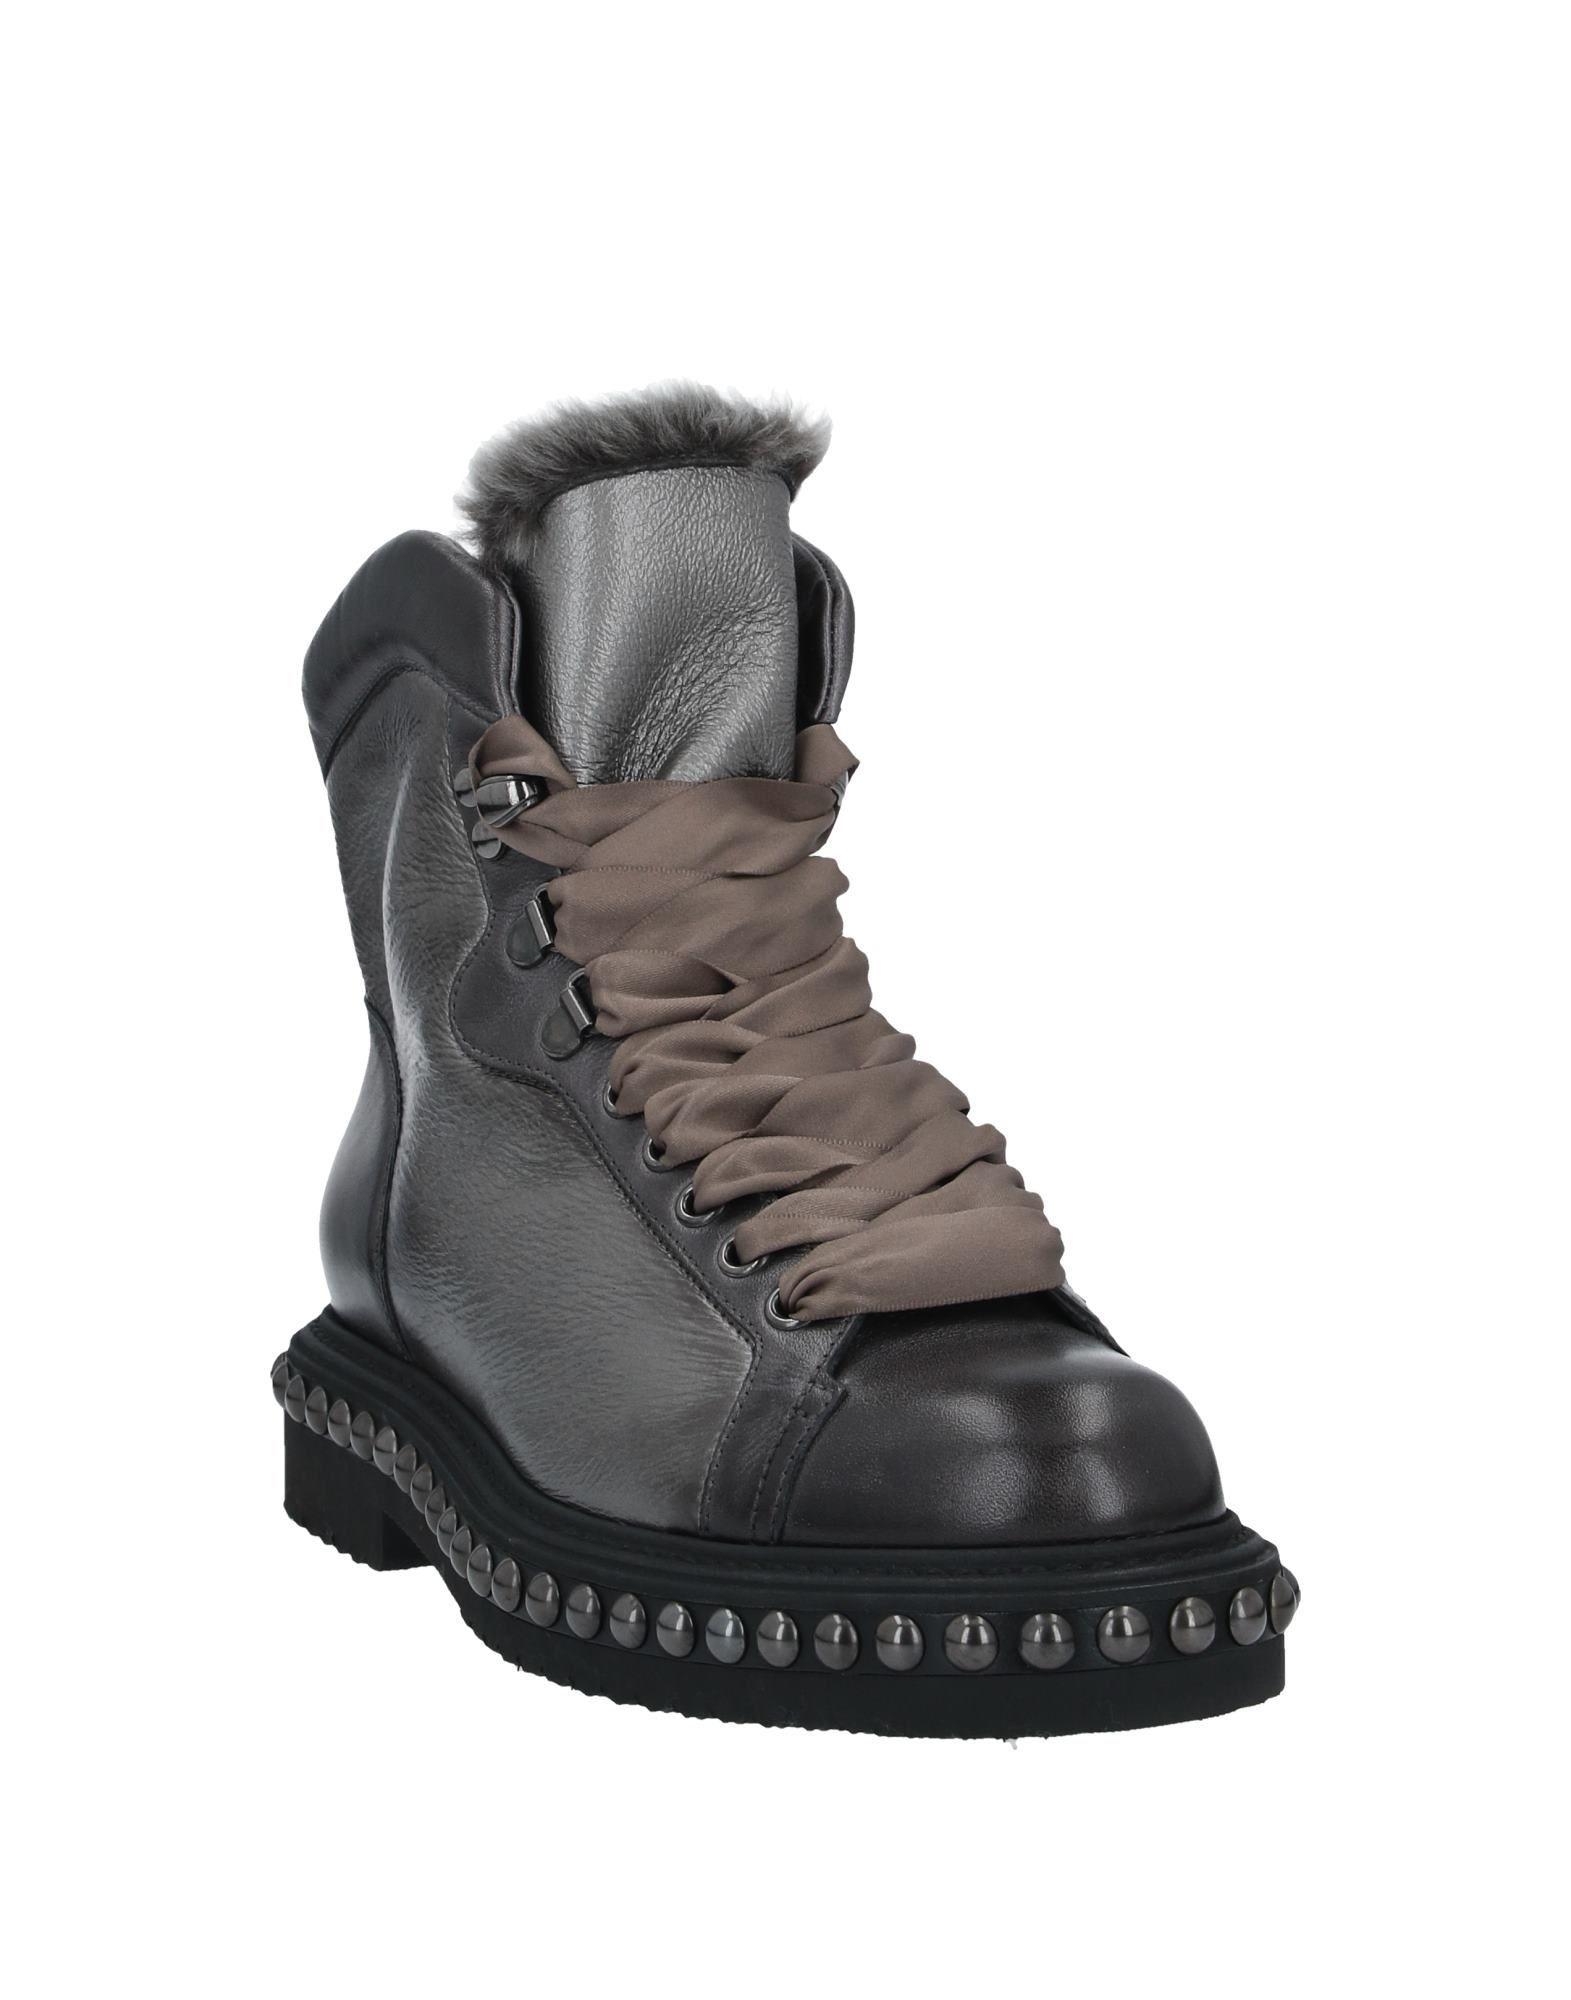 Santoni Lead Leather Ankle Boots